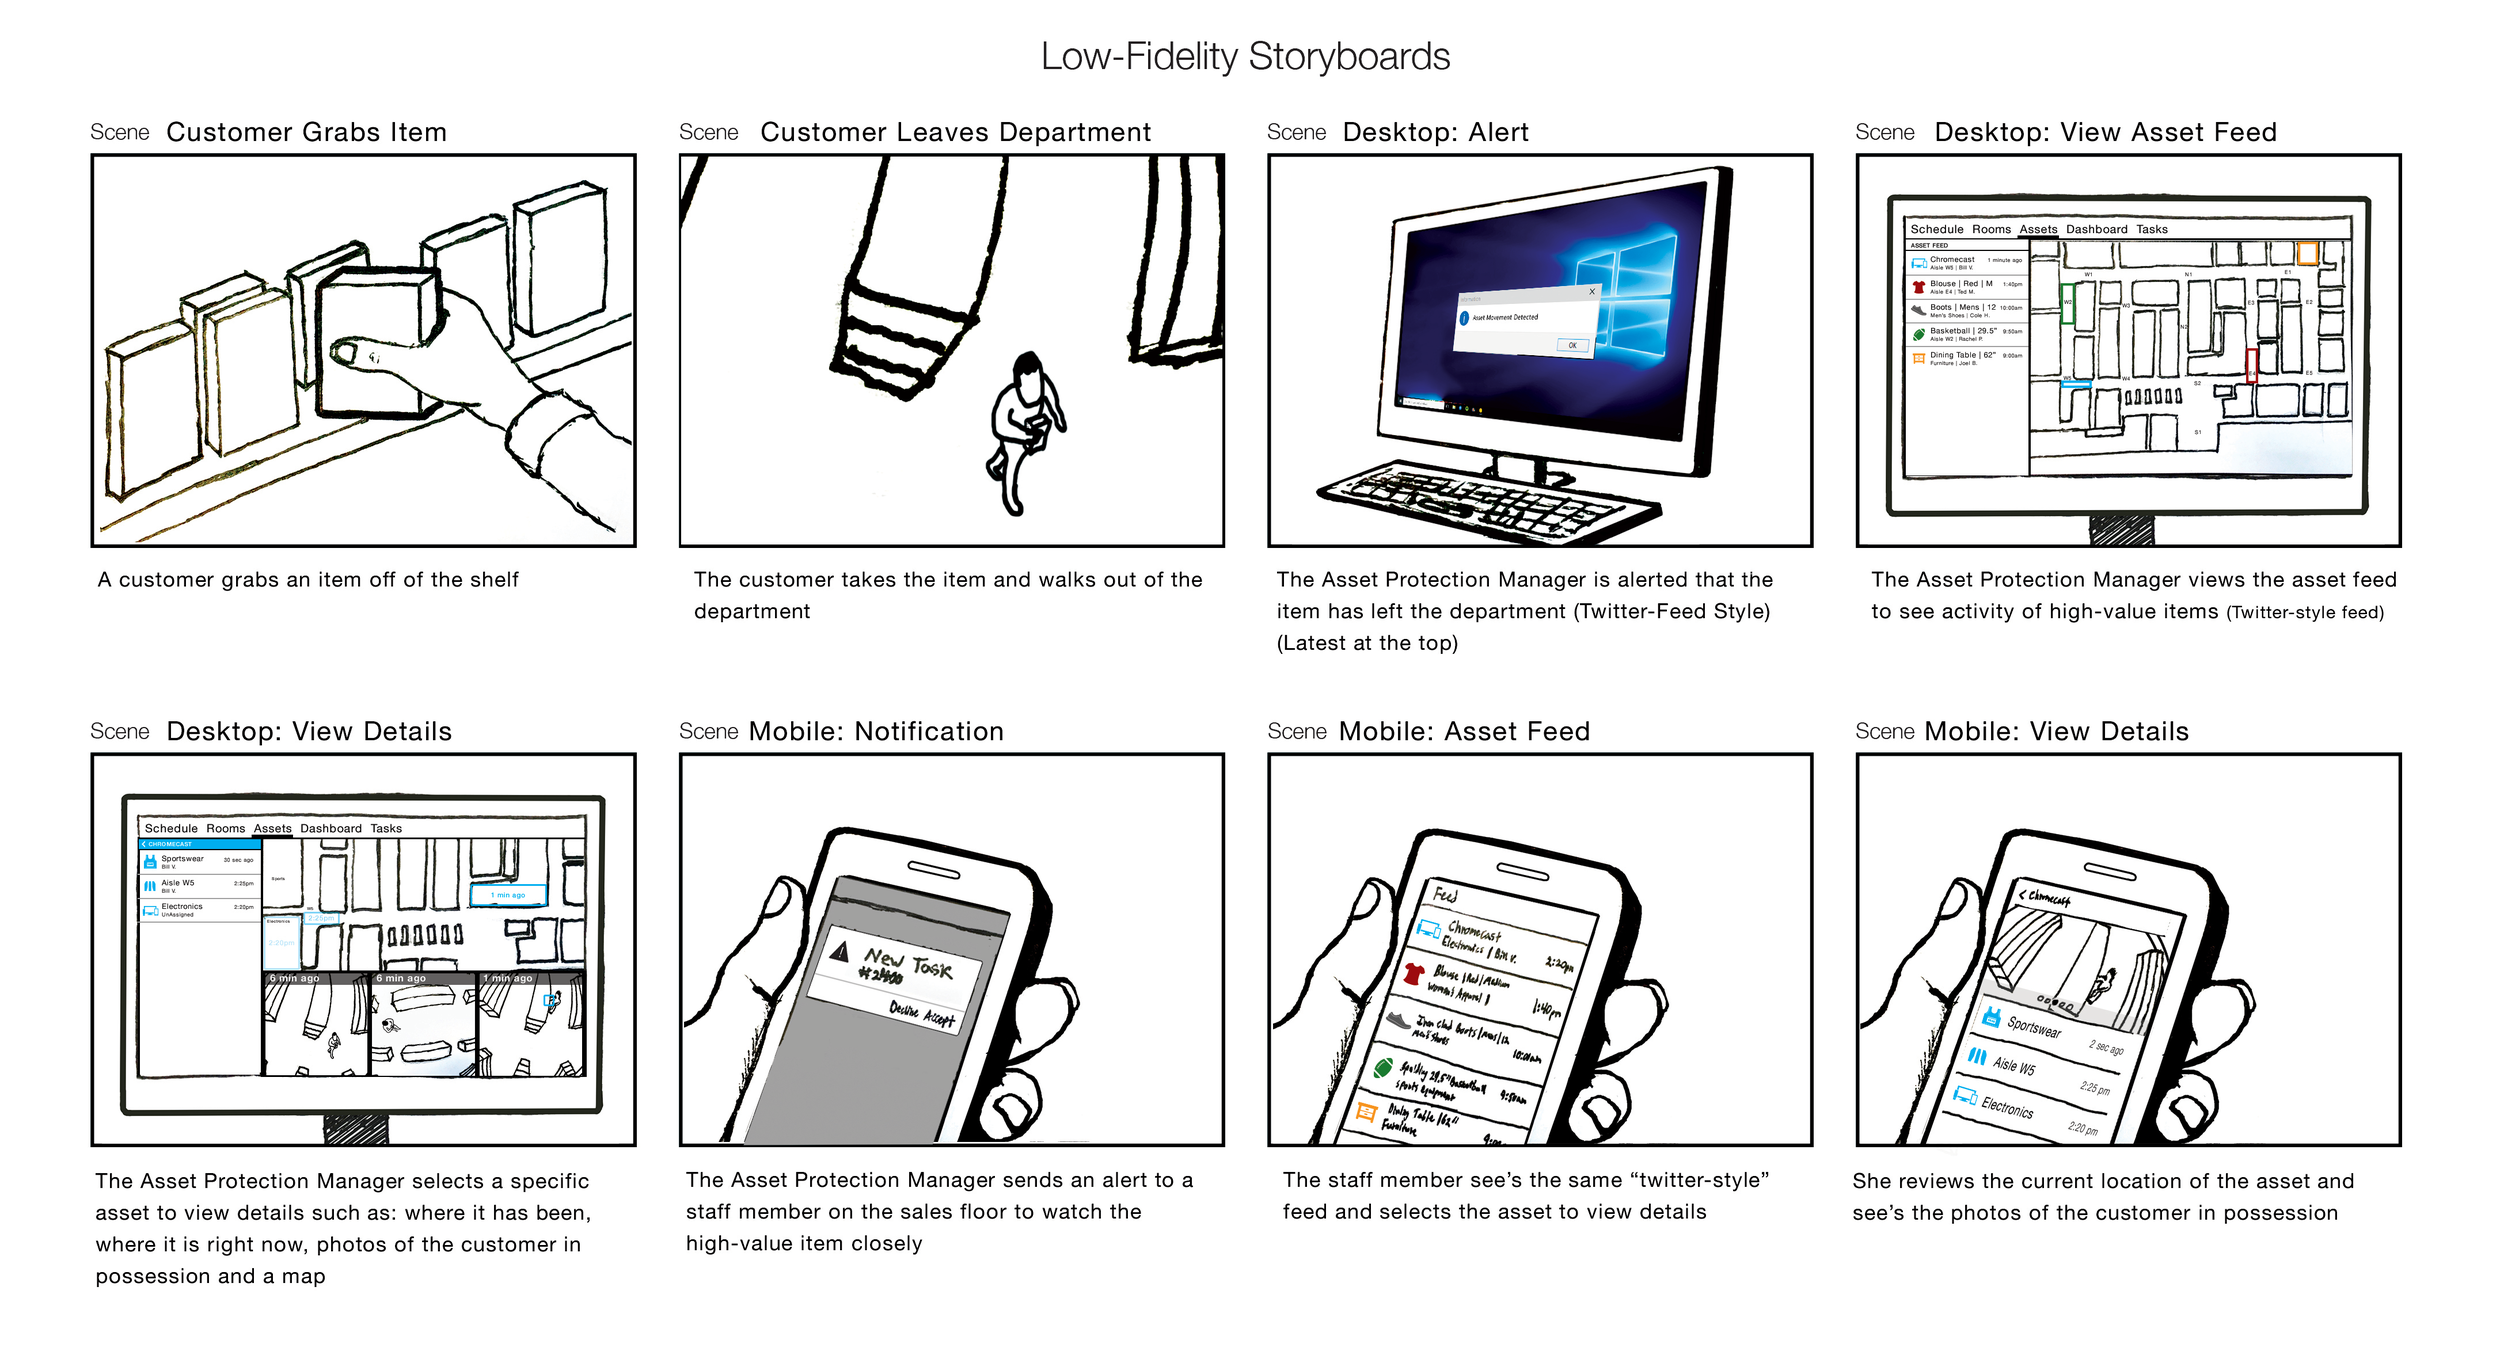 AssetProtection_Storyboard.png